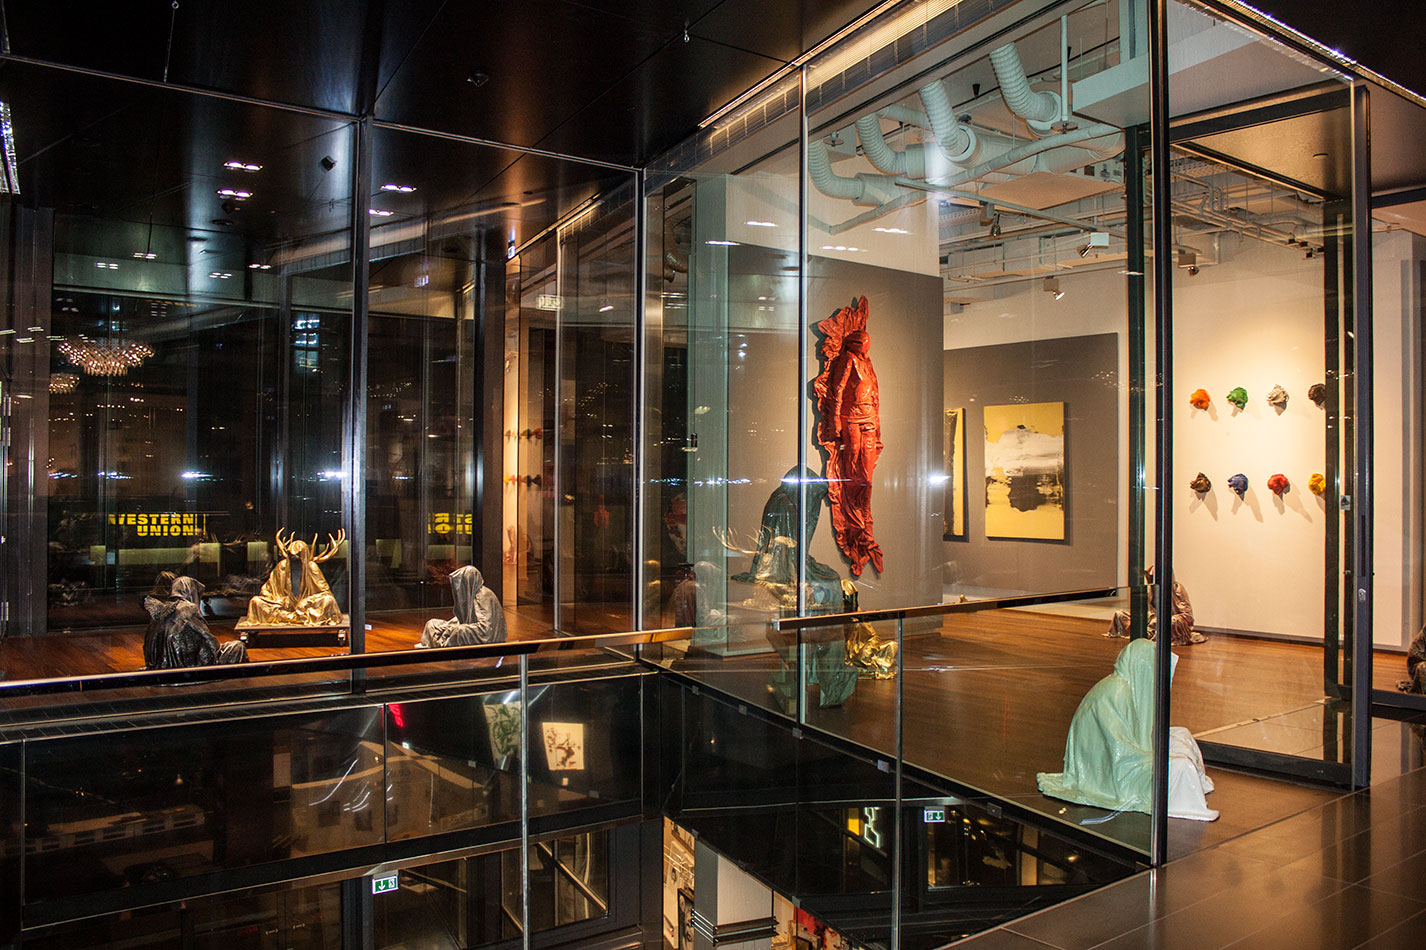 stilwerk-wien-designtower-vienna-show-guardians-of-time-waechter-der-zeit-manfred-kielnhofer-modern-contemporary-fine-art-design-sculpture-3d-arts-3957